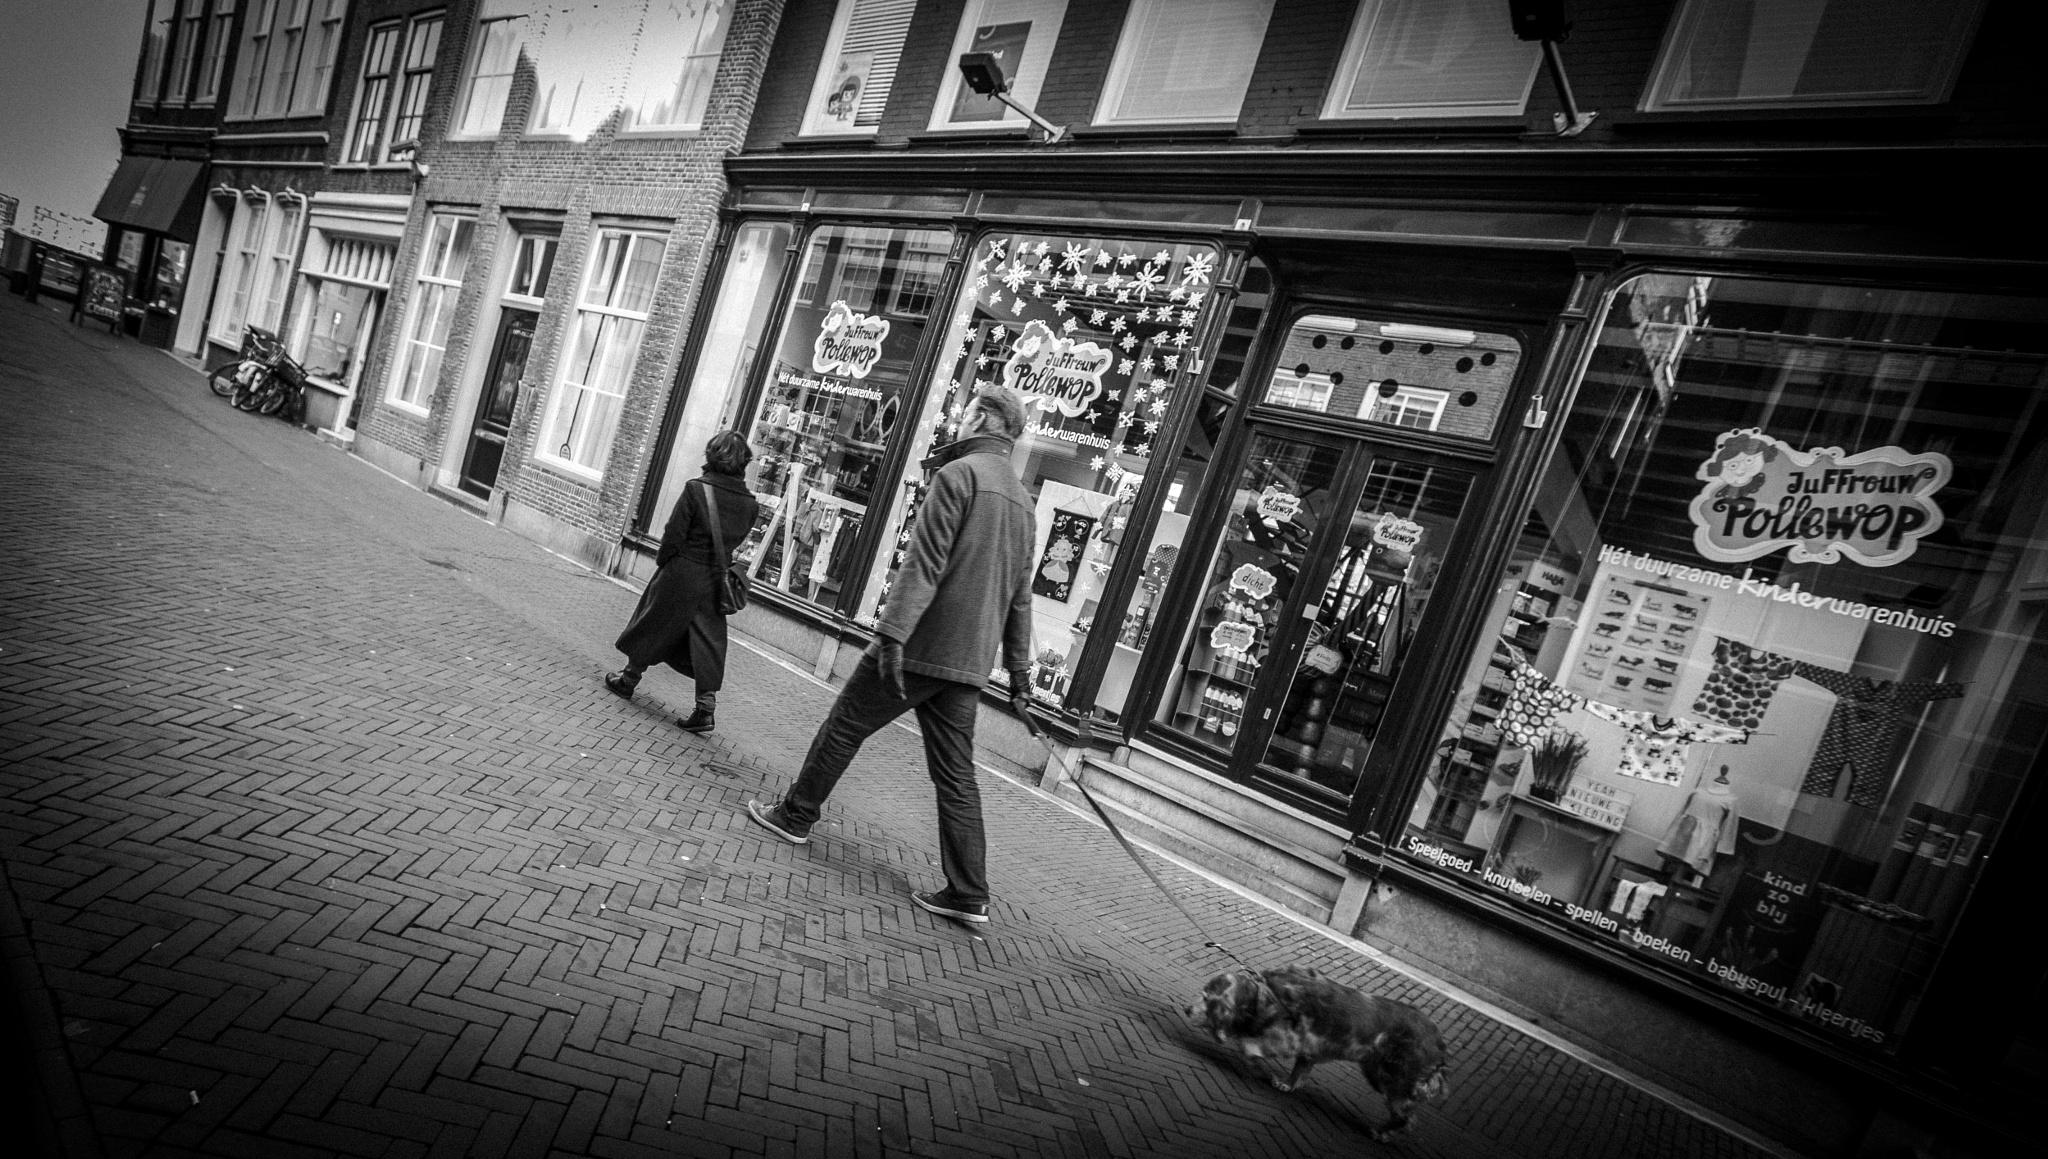 Walking the DOG by ad.kesteloo